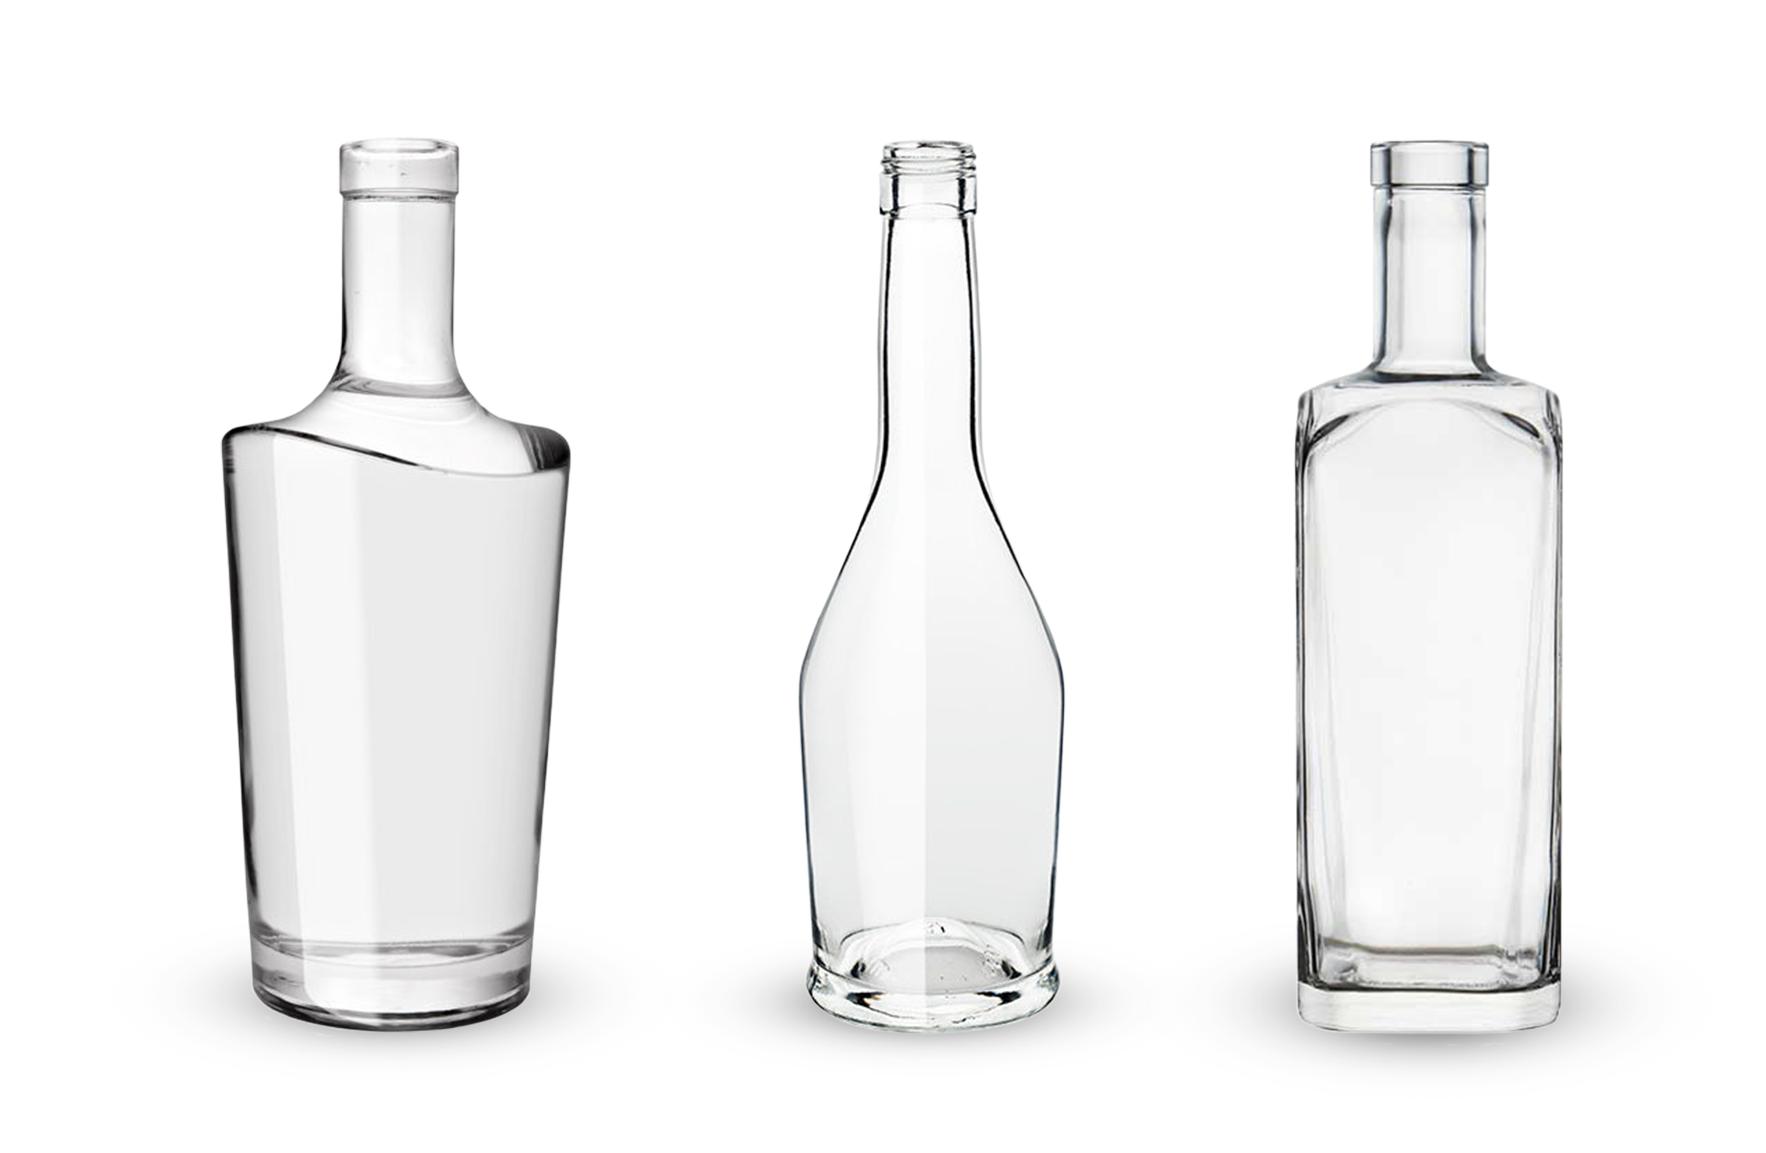 Novio Packaging | PET, HDPE, Glass jars and bottles